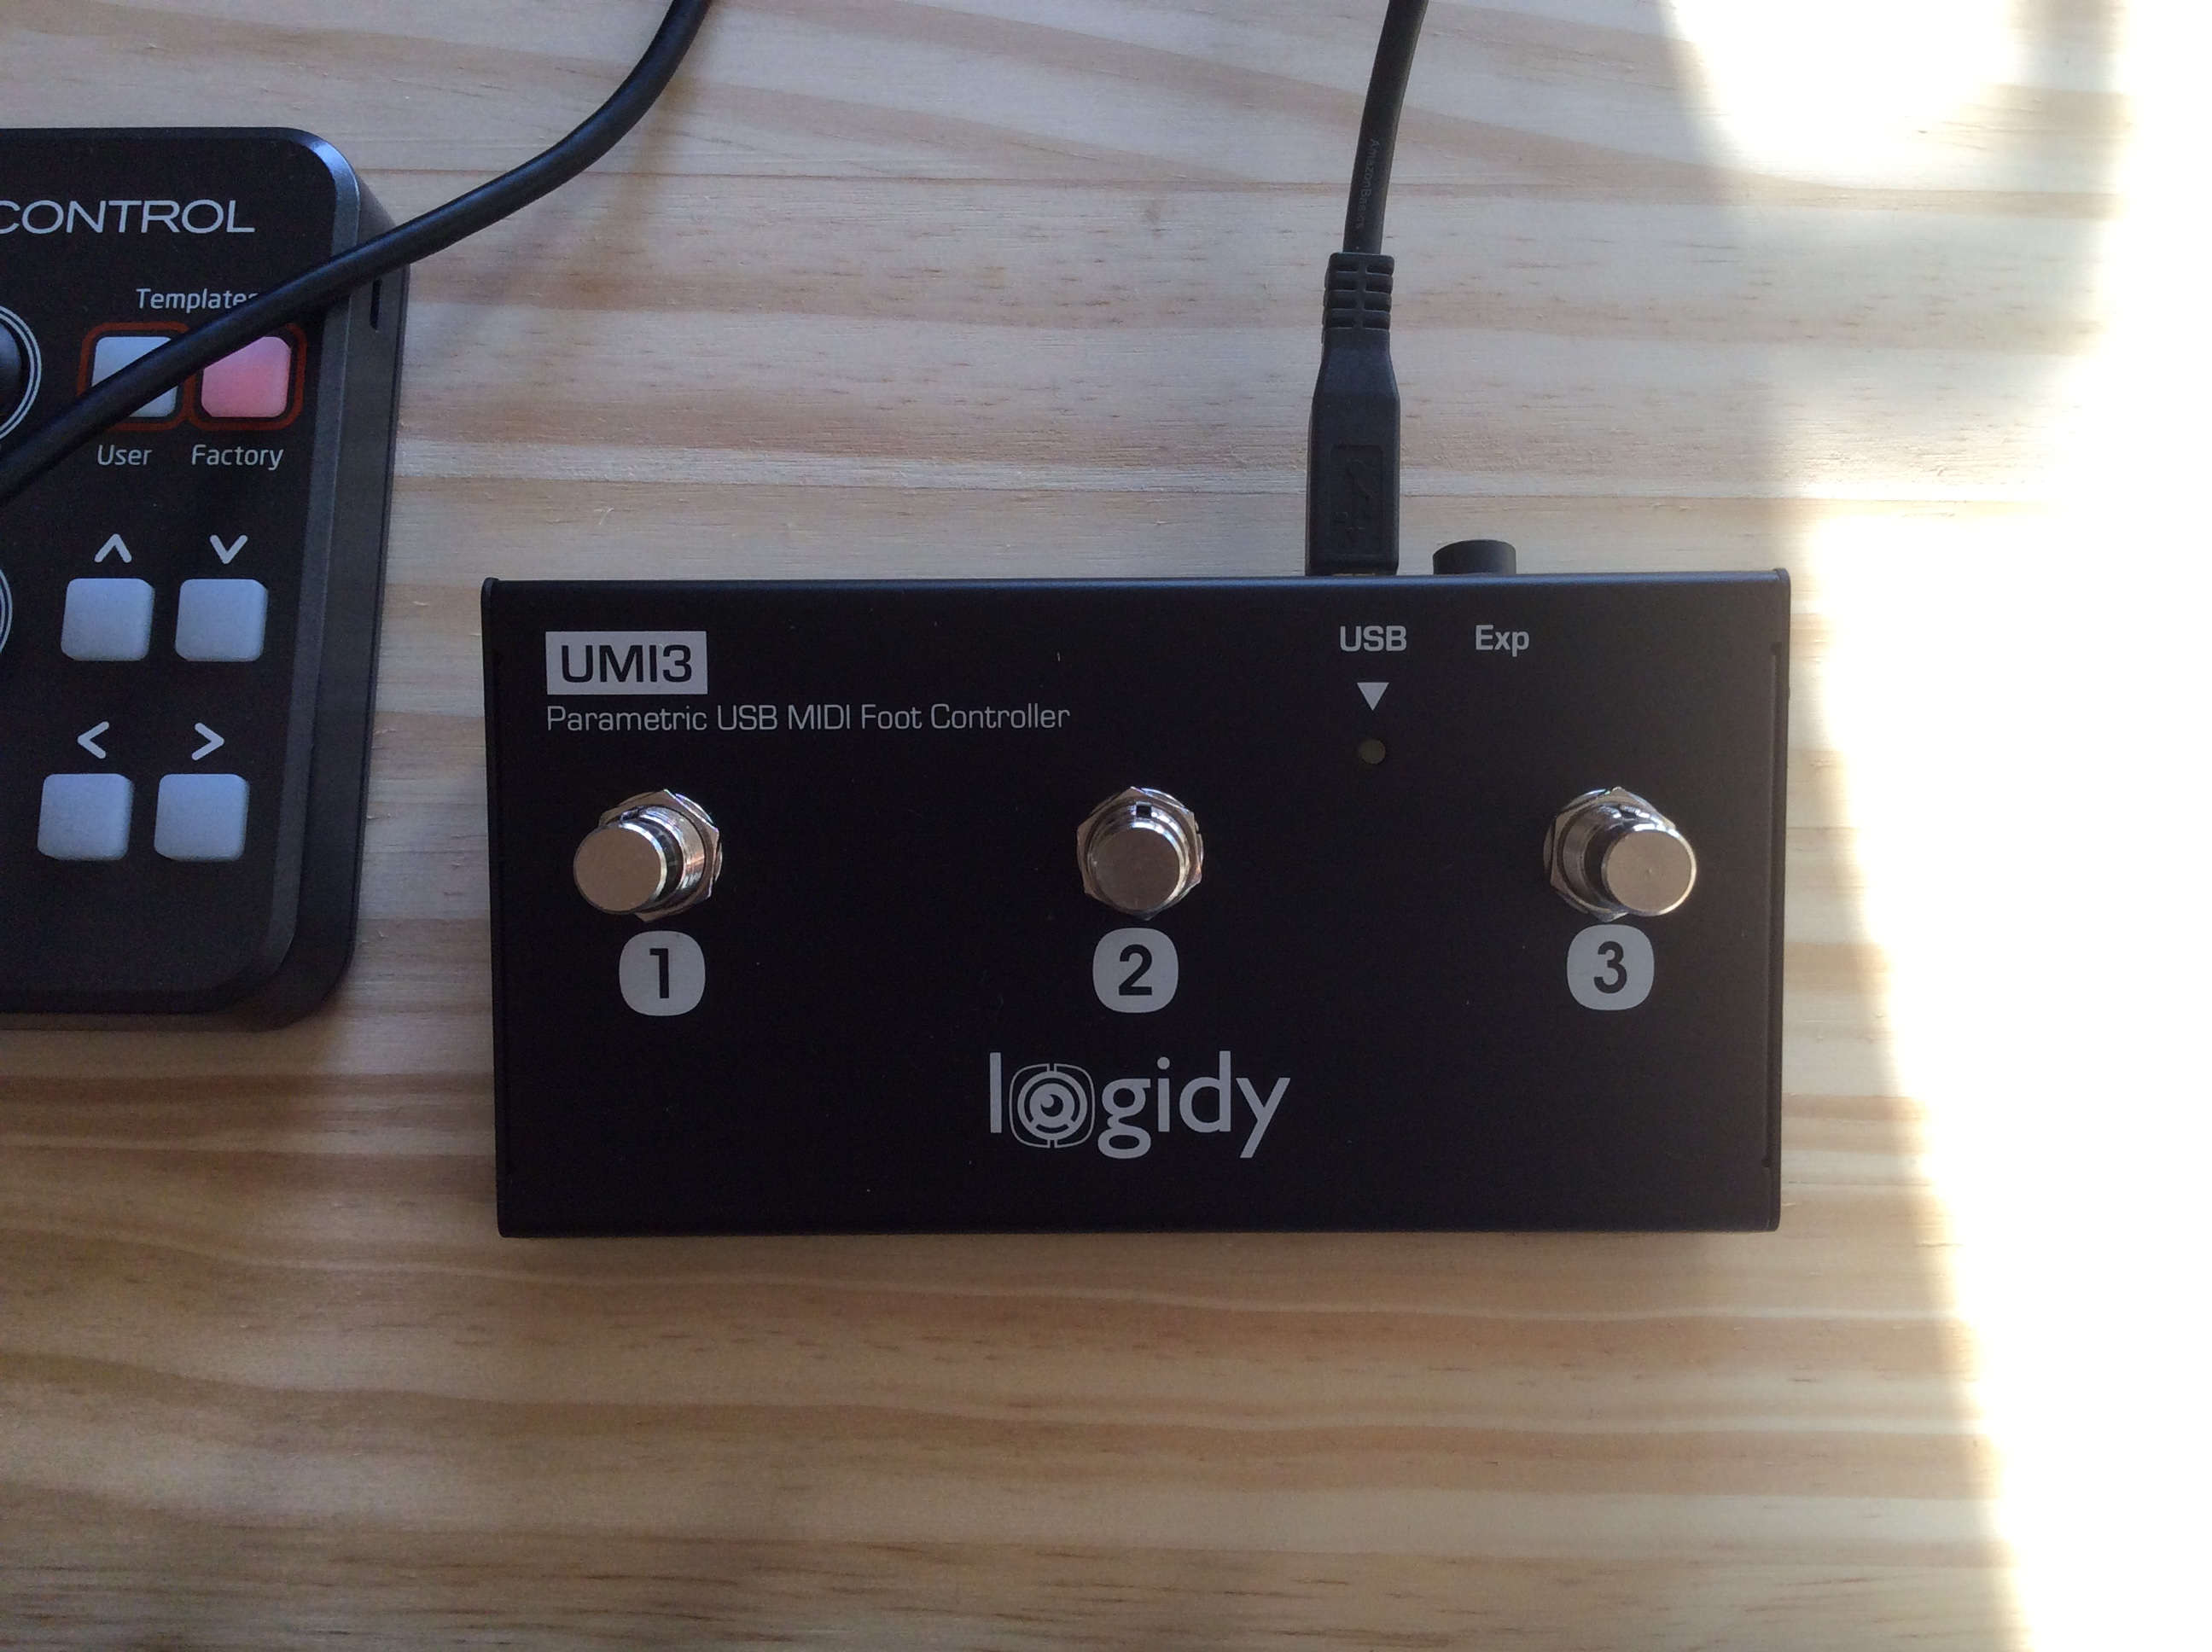 Logidy UMI3 MIDI over USB Foot Controller